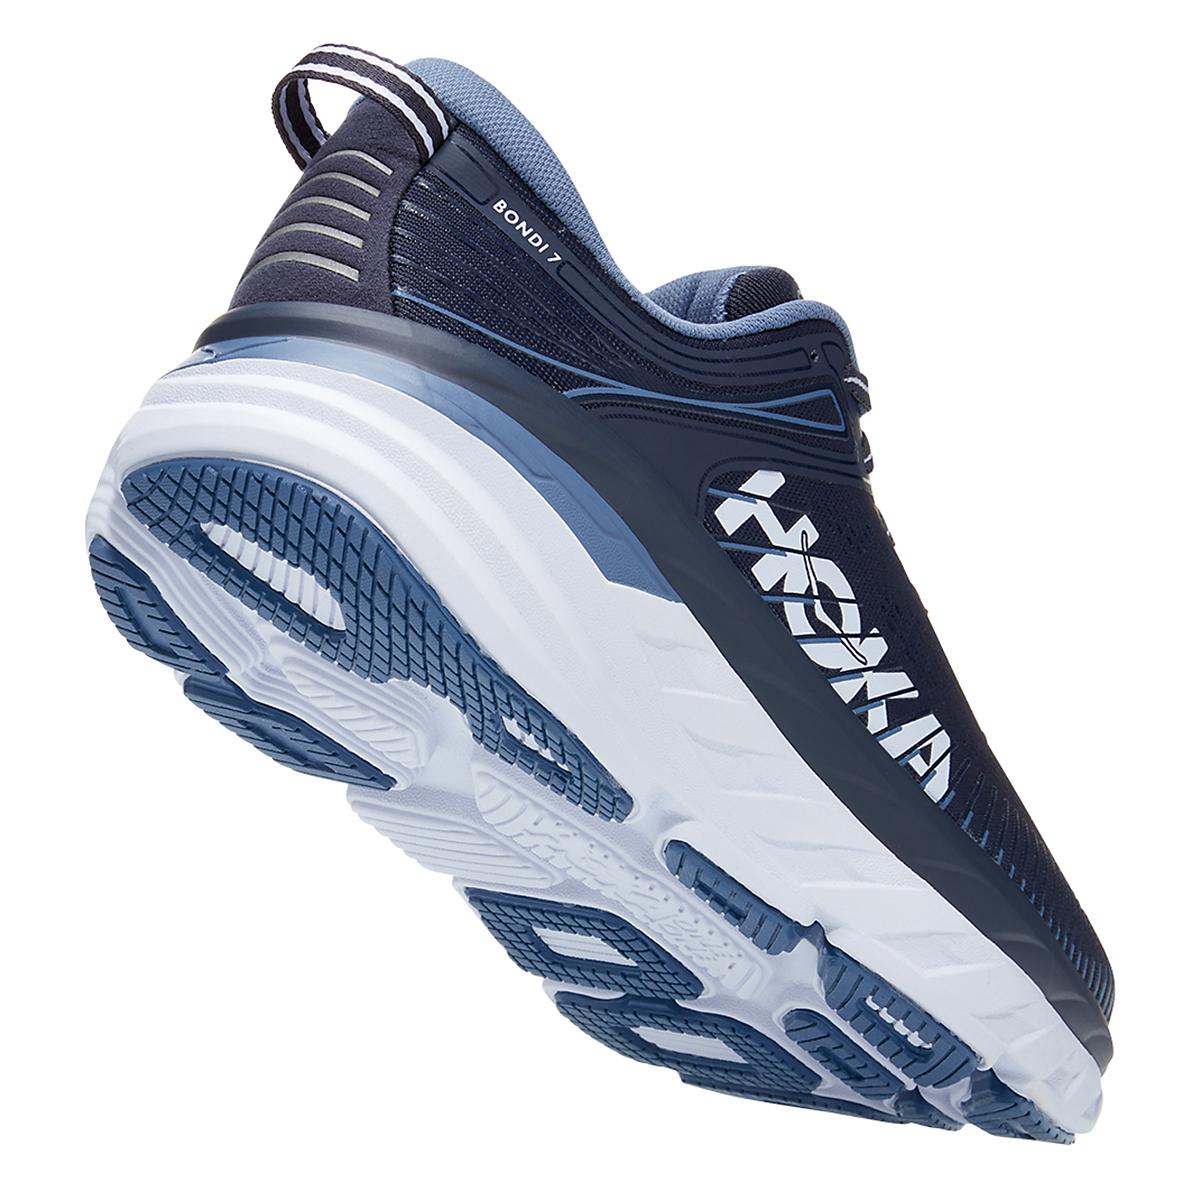 Men's Hoka One One Bondi 7 Running Shoe - Color: Ombre Blue/Provincial Blue - Size: 7 - Width: Regular, Ombre Blue/Provincial Blue, large, image 3